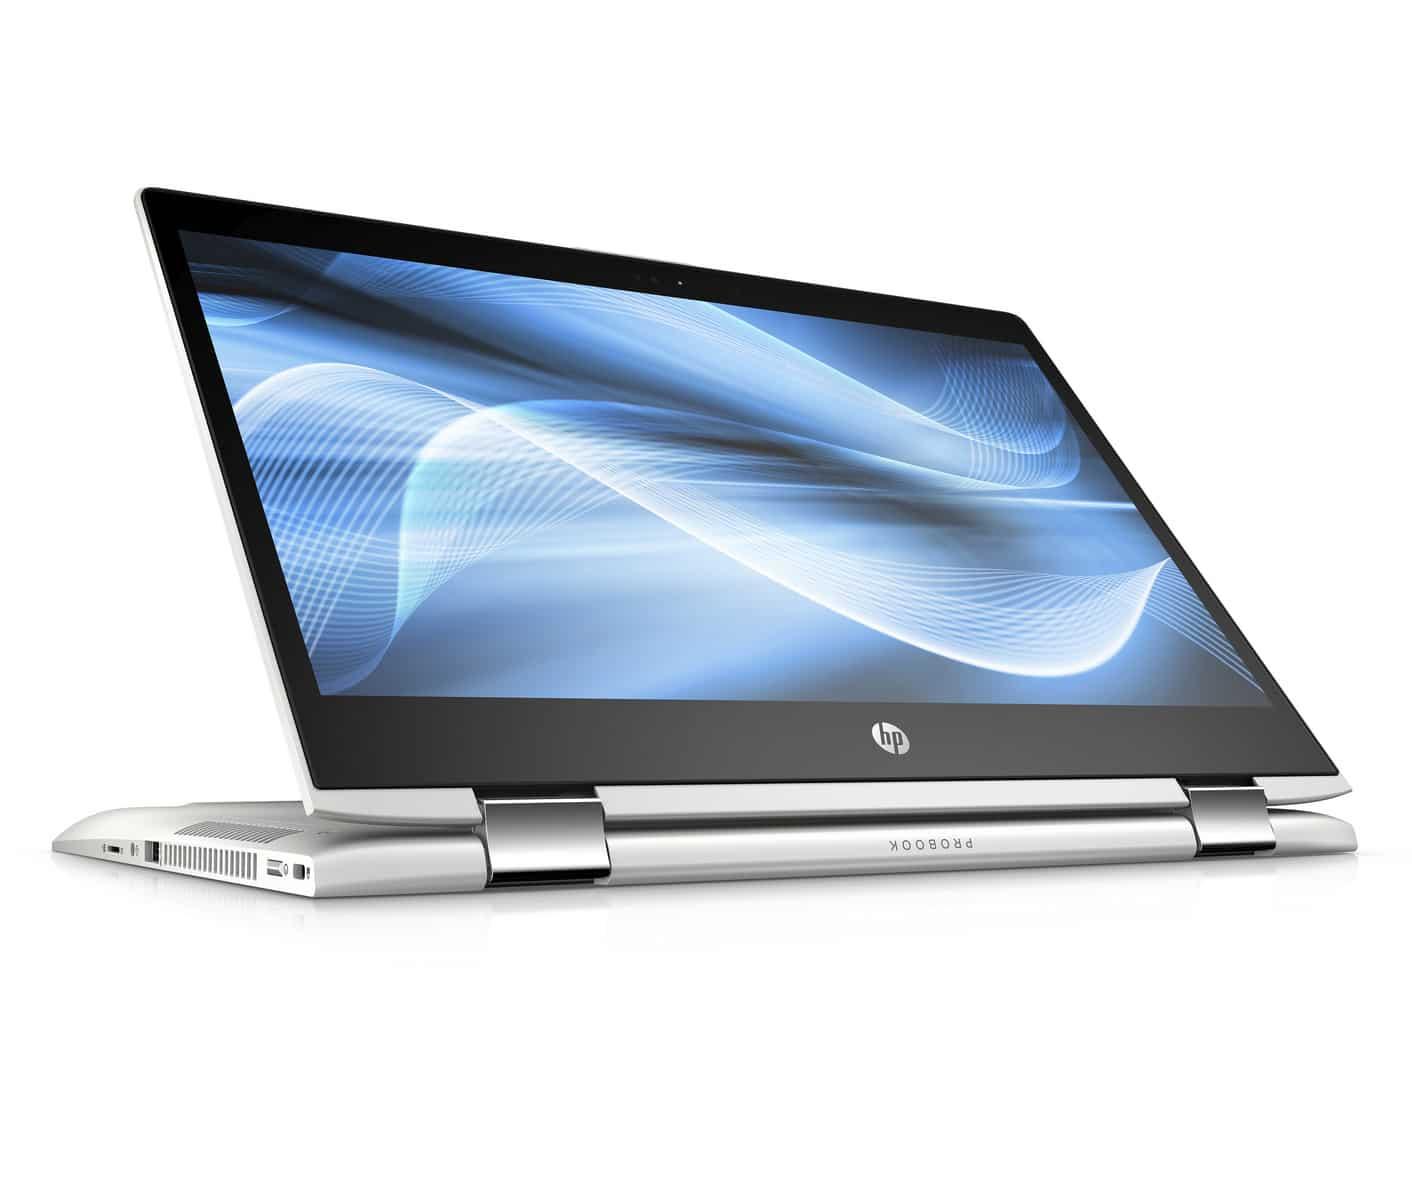 "<span class=""tagtitre"">Computex 2018 - </span>HP ProBook x360 440 G1, Ultrabook convertible Tablette"